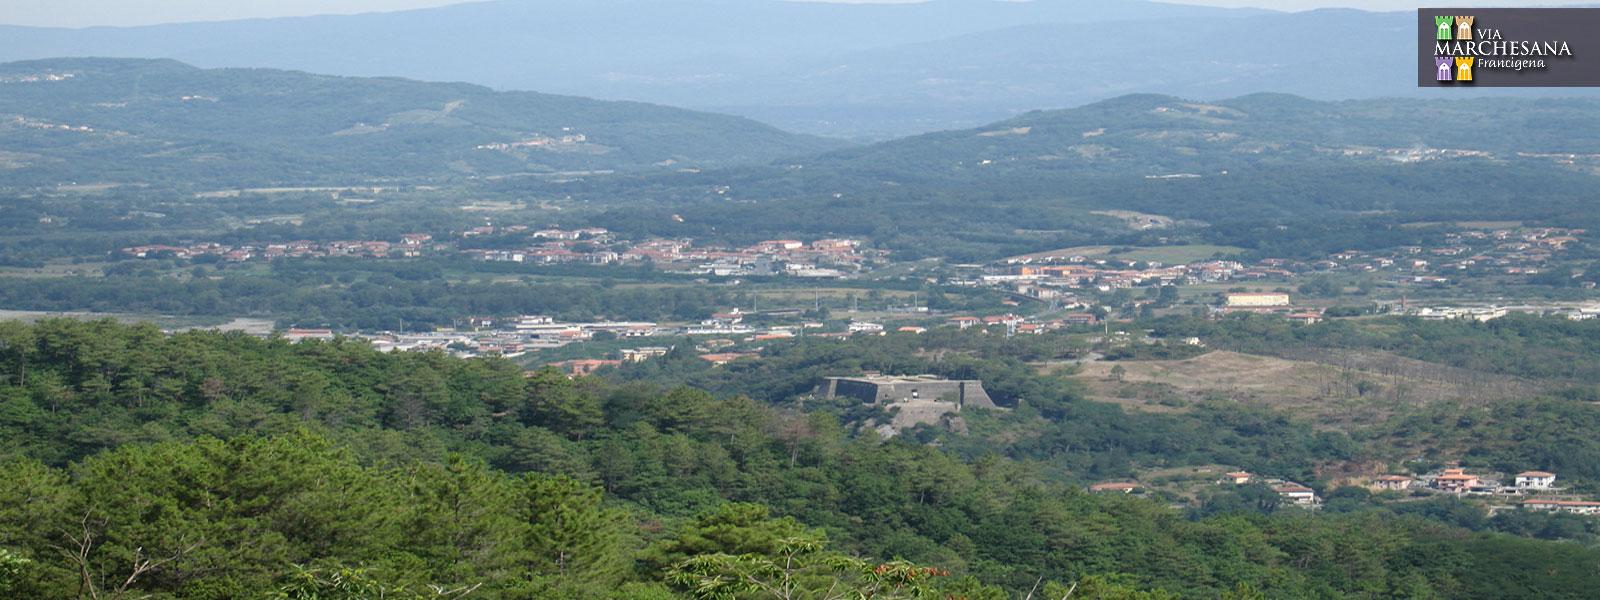 panorama-toscano-002